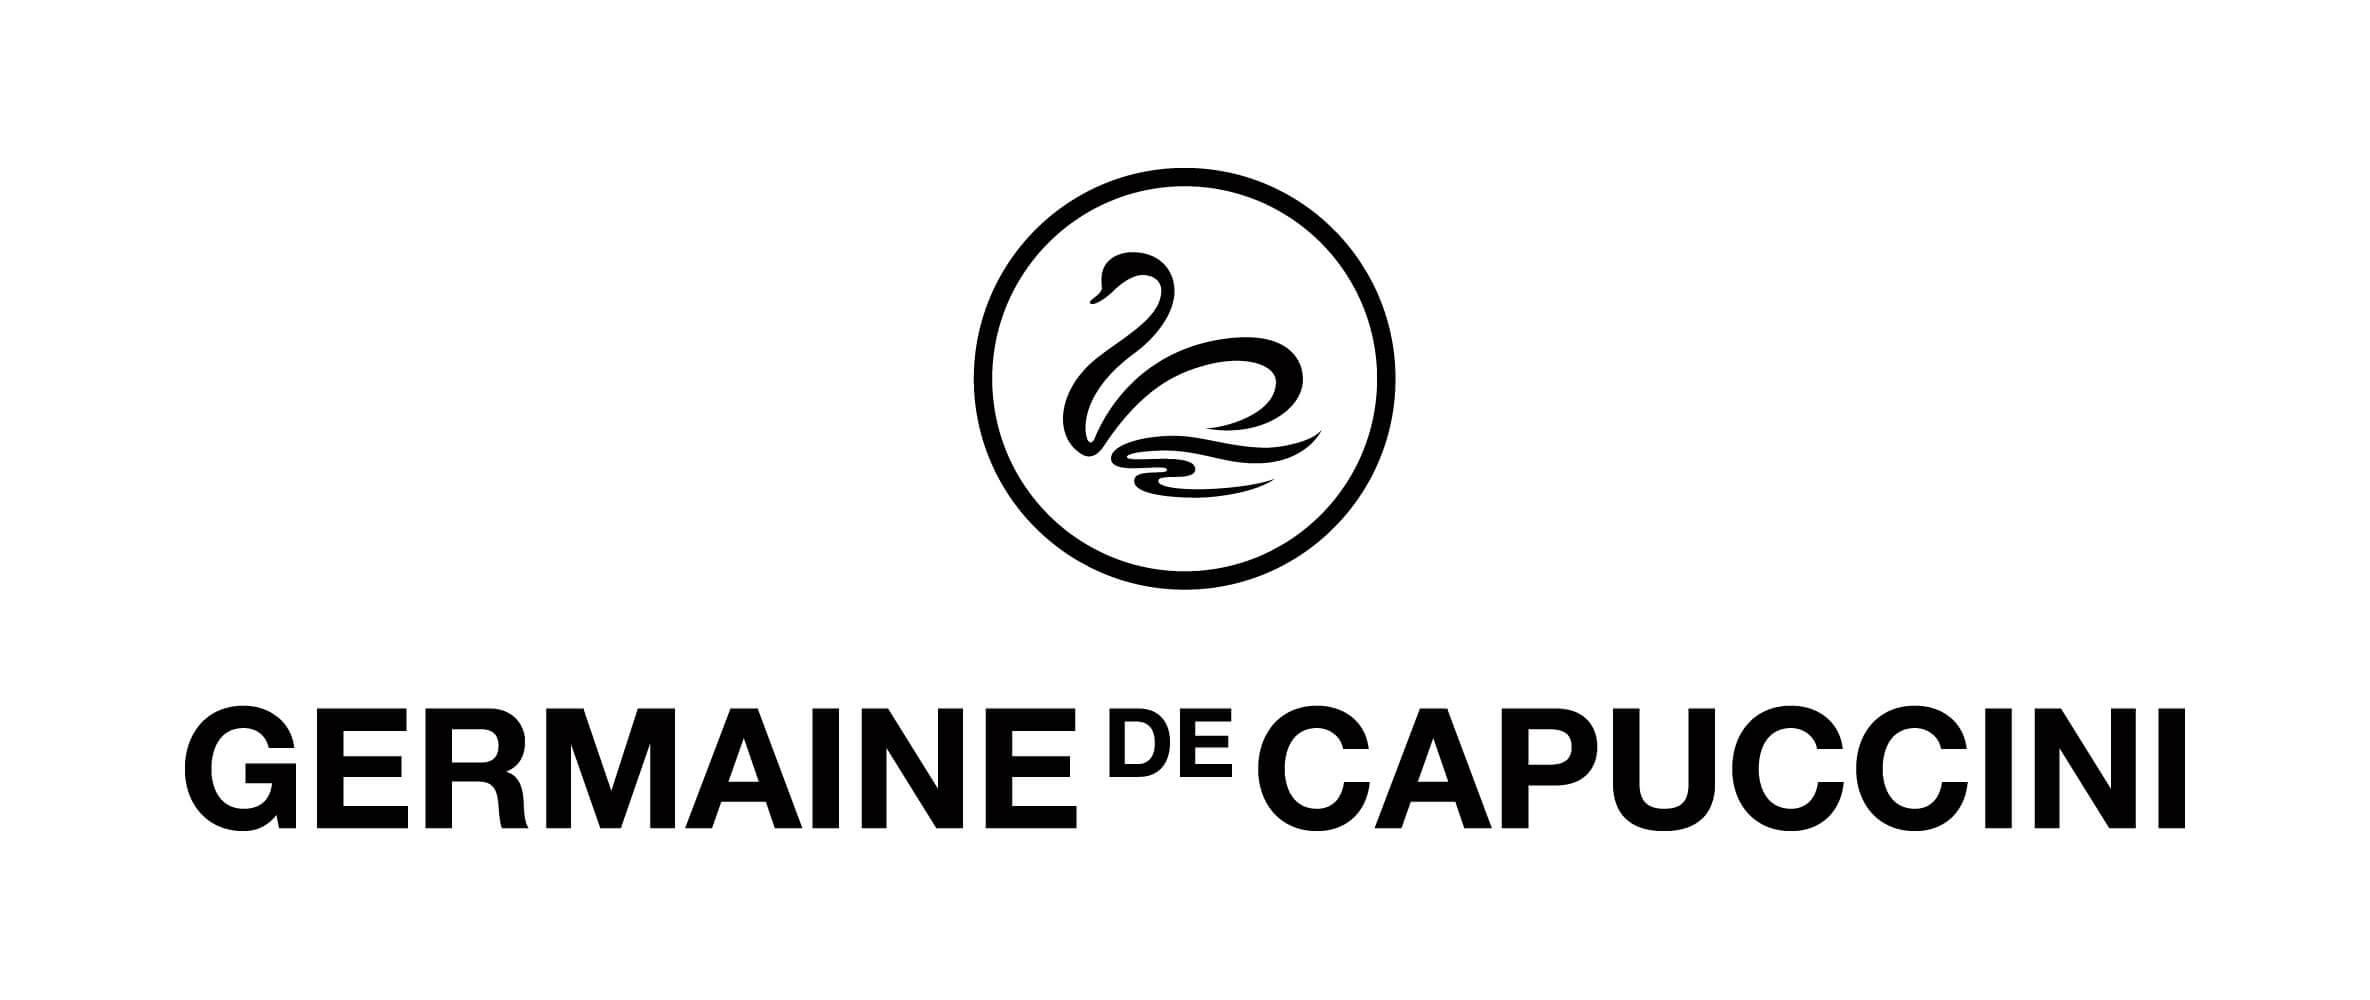 Germaine De Cappuccini Skincare Logo